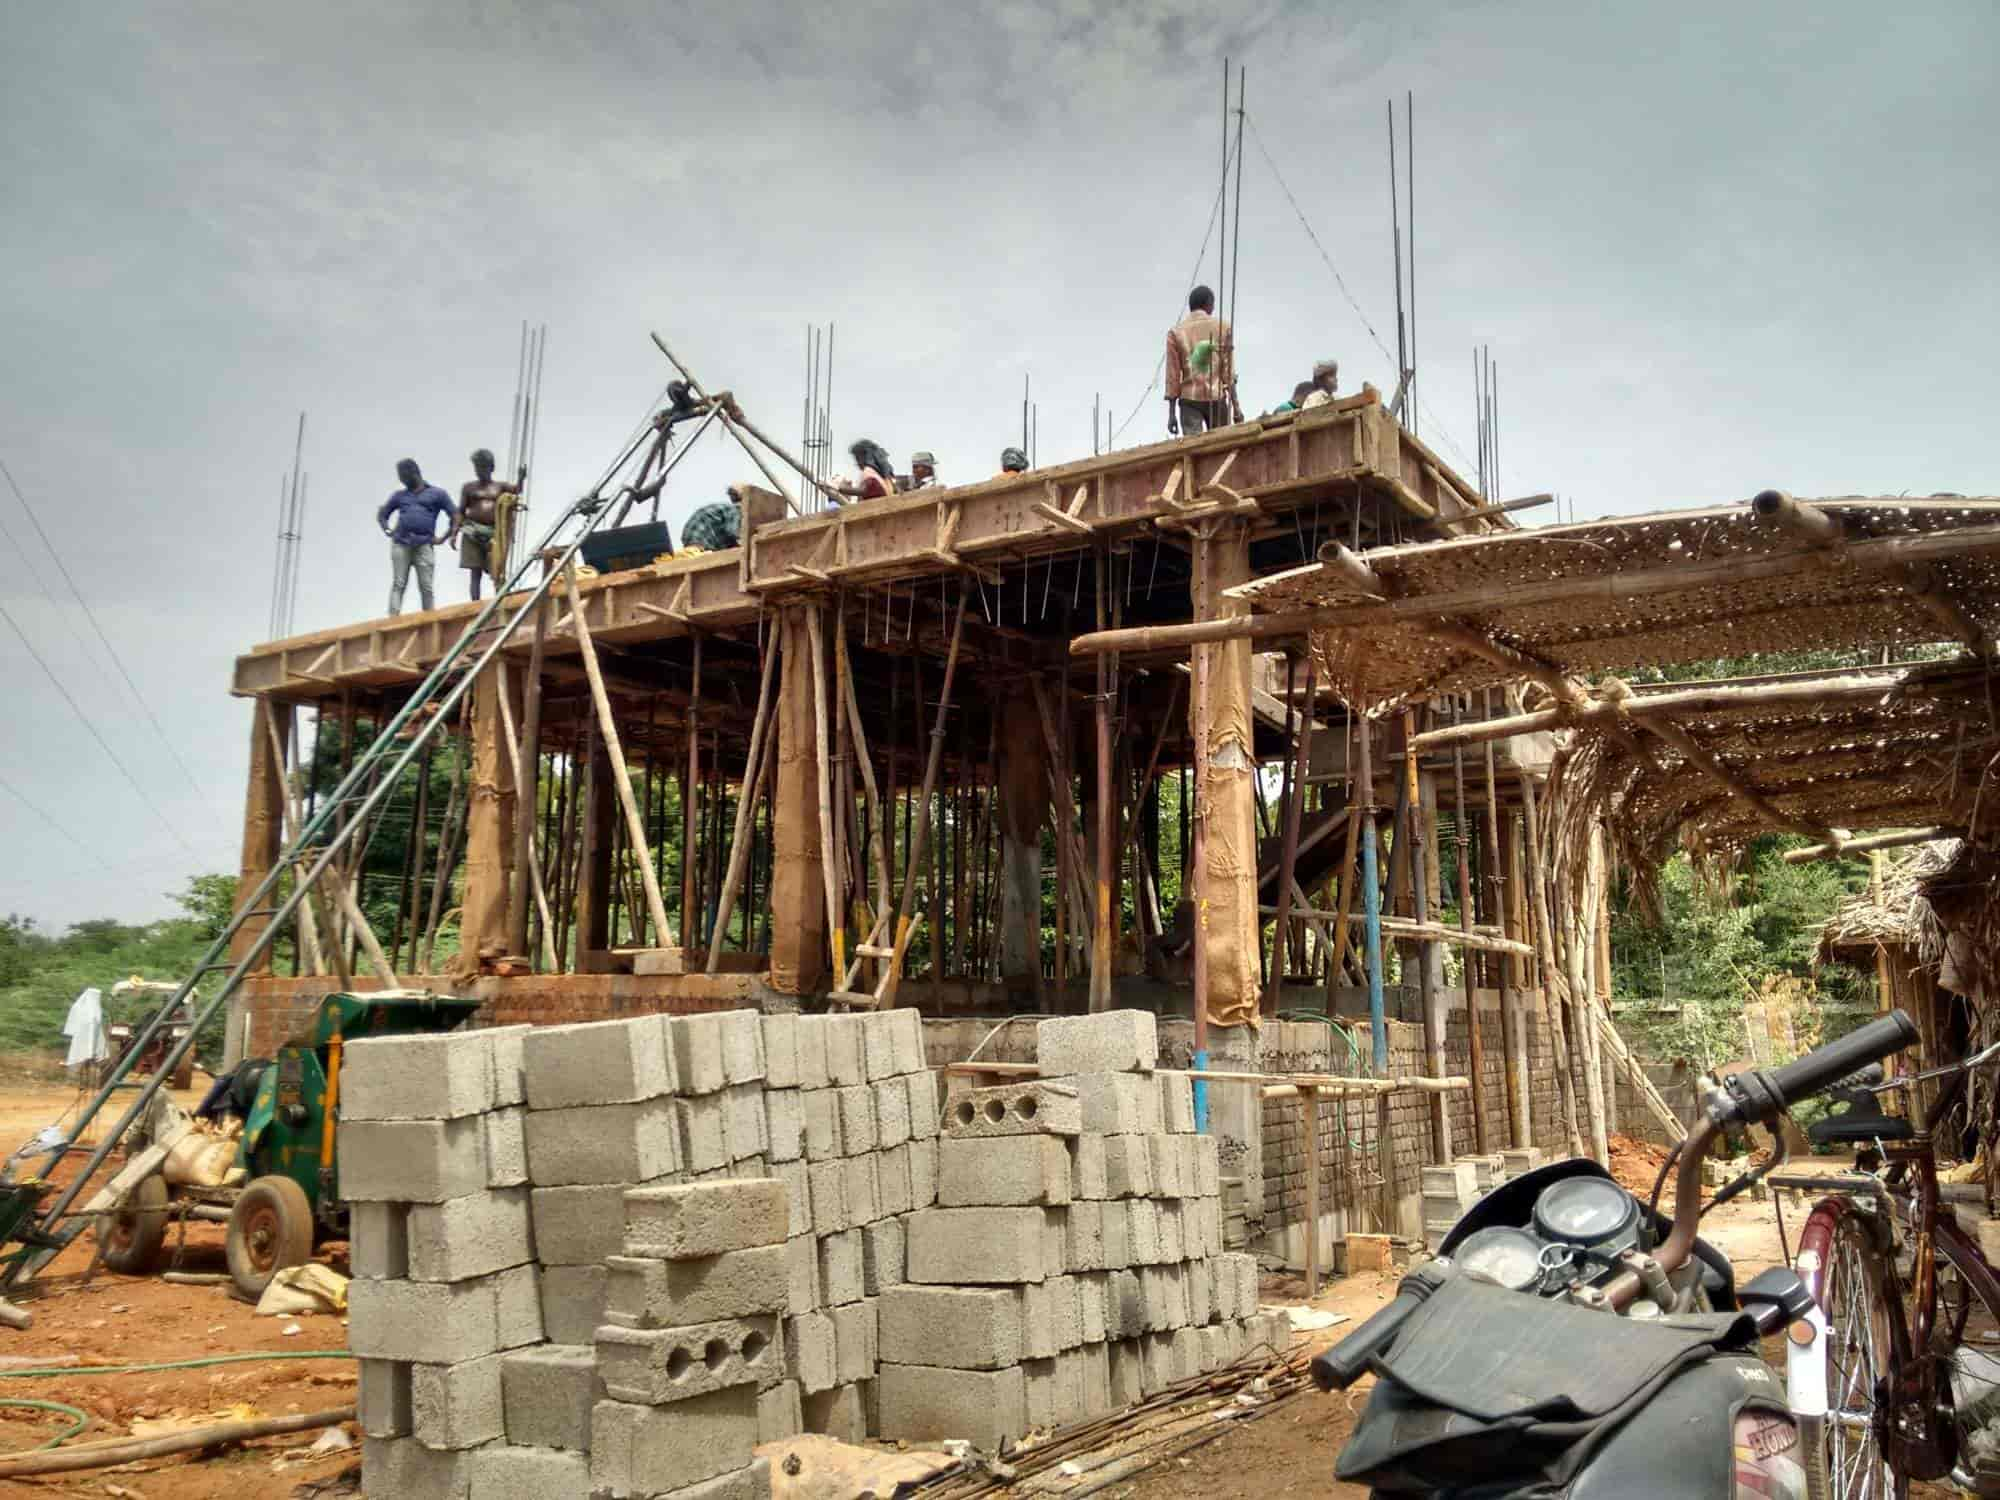 https://content3.jdmagicbox.com/comp/chennai/i1/044pxx44.xx44.100909191054.n8i1/catalogue/mmk-building-construction-perumbakkam-chennai-building-contractors-3zuy8h6.jpg